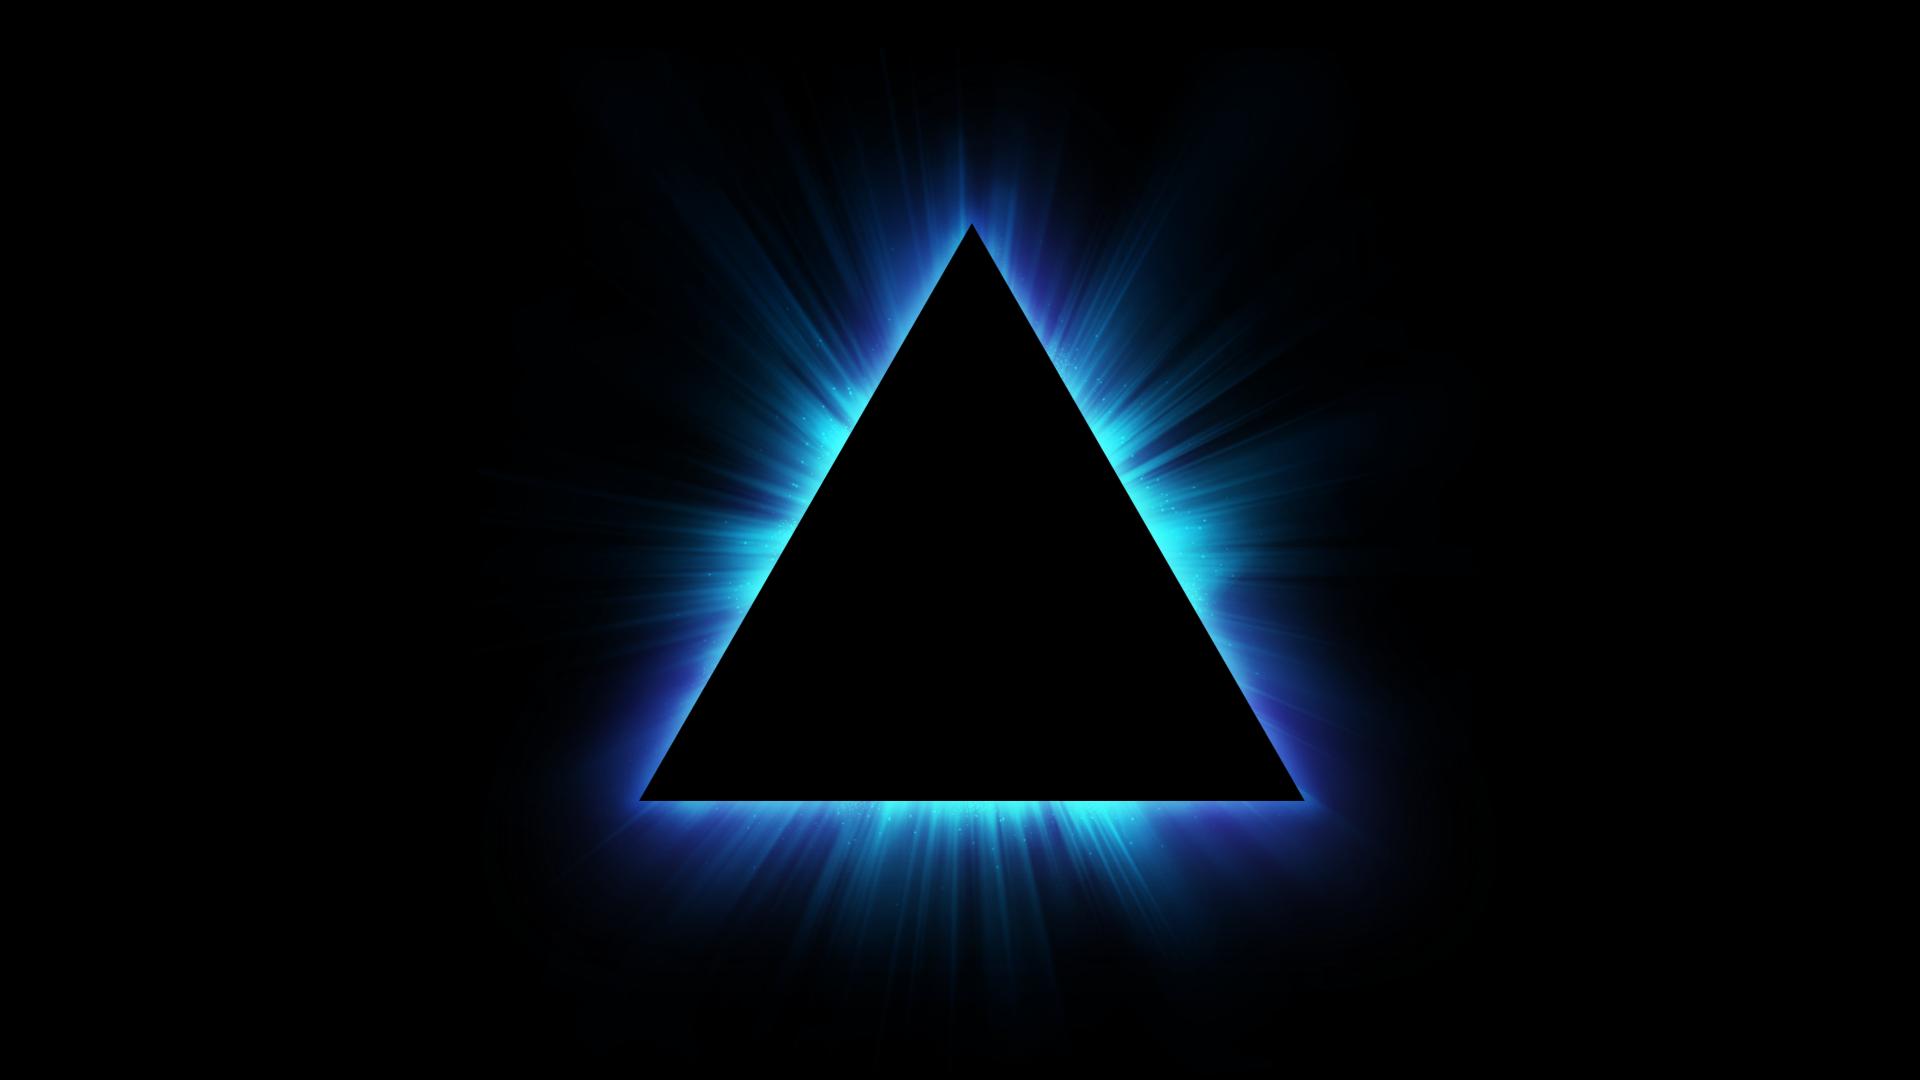 illuminati symbol wallpaper 1920x1080 - photo #14